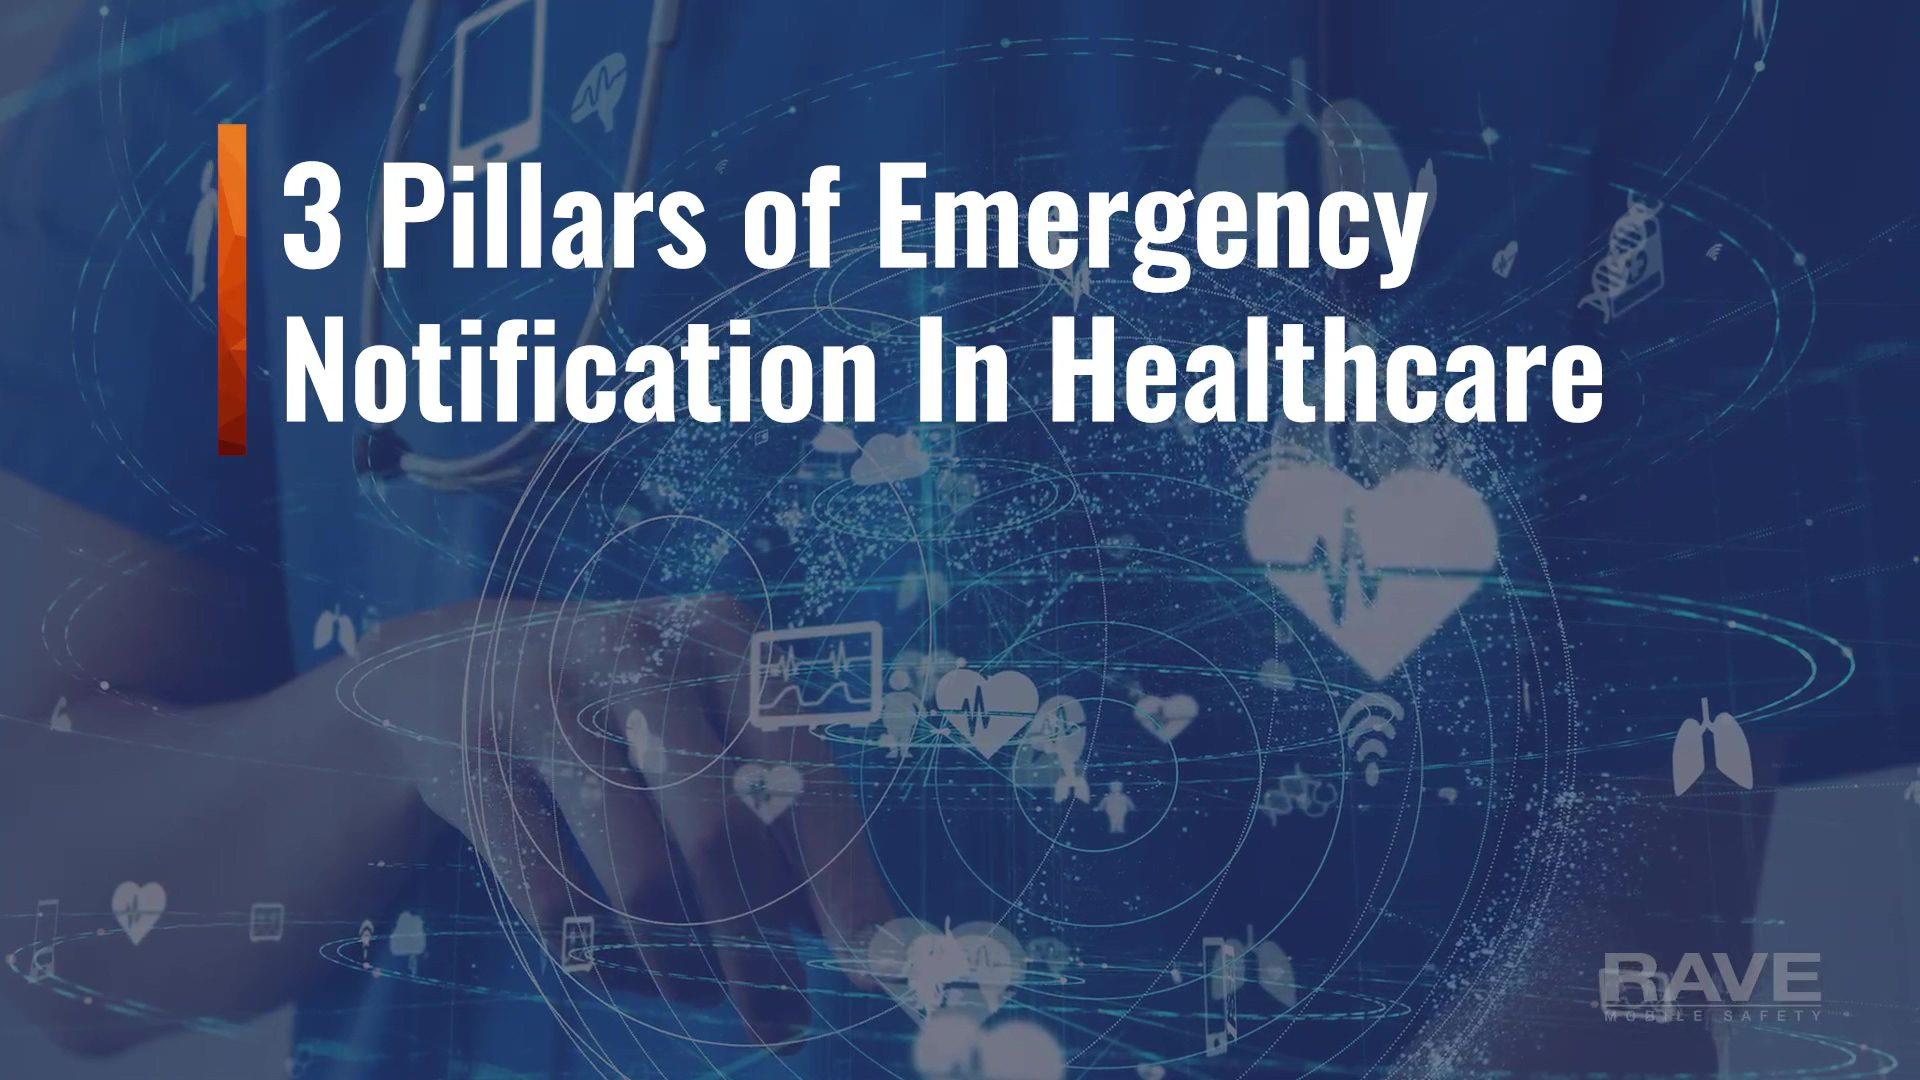 3_pillars_of_emergency_notification_in_healthcare